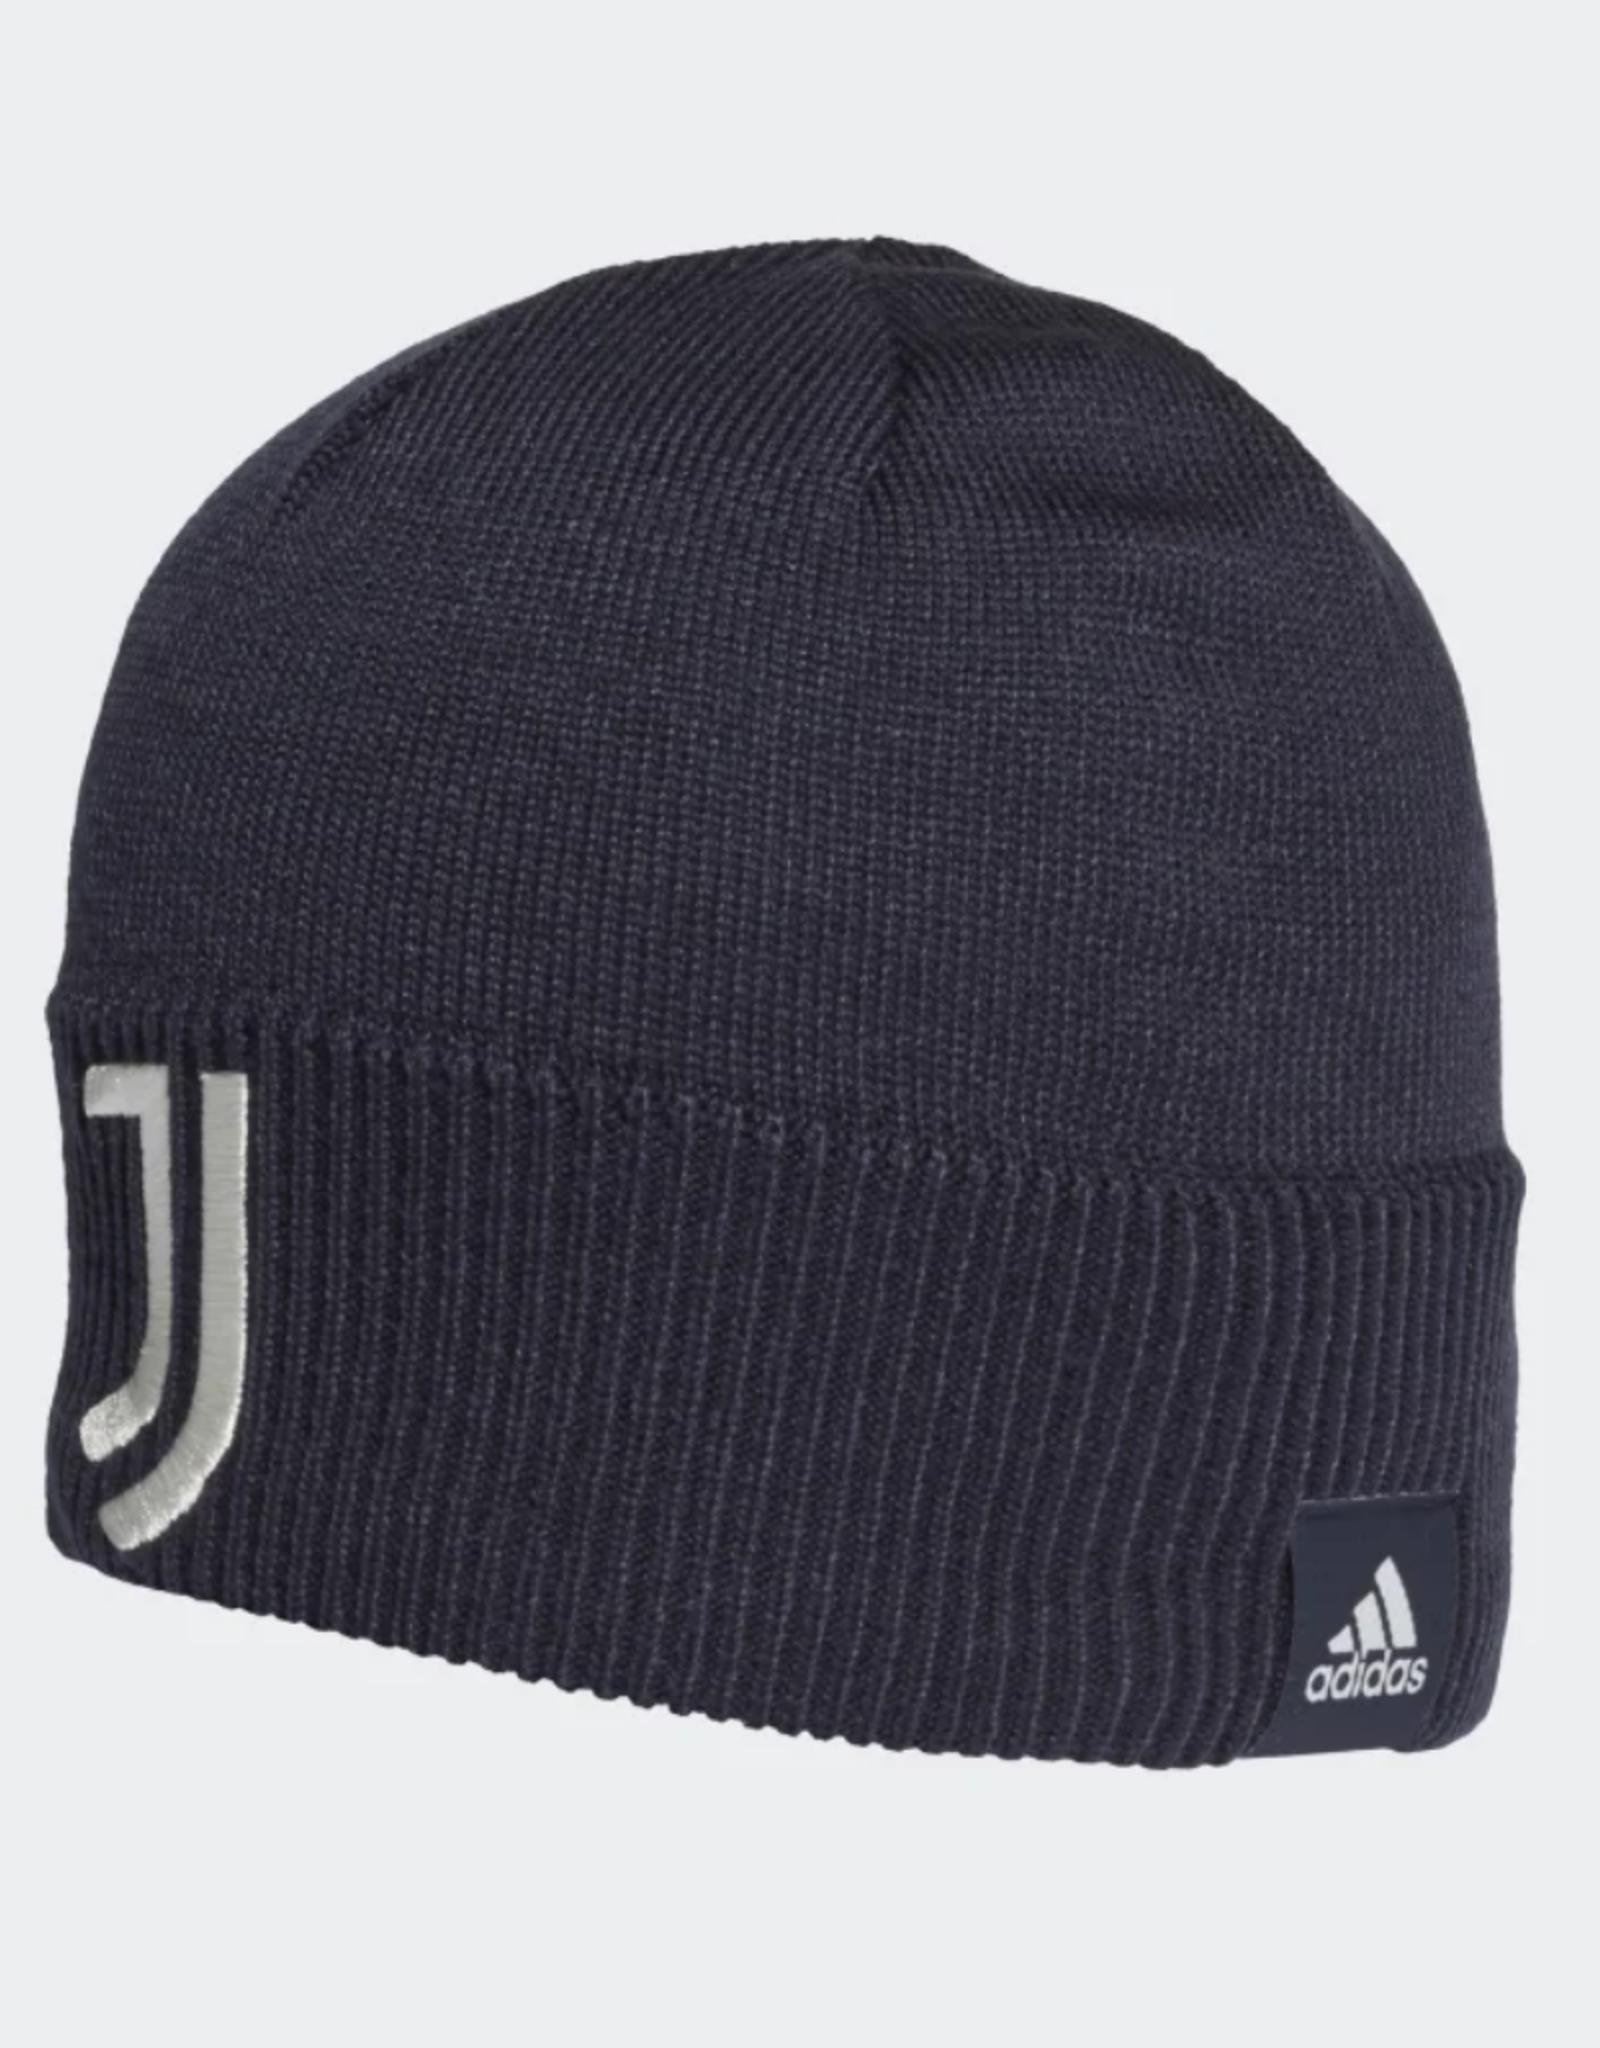 Adidas Adidas Men's Juventus Beanie Navy